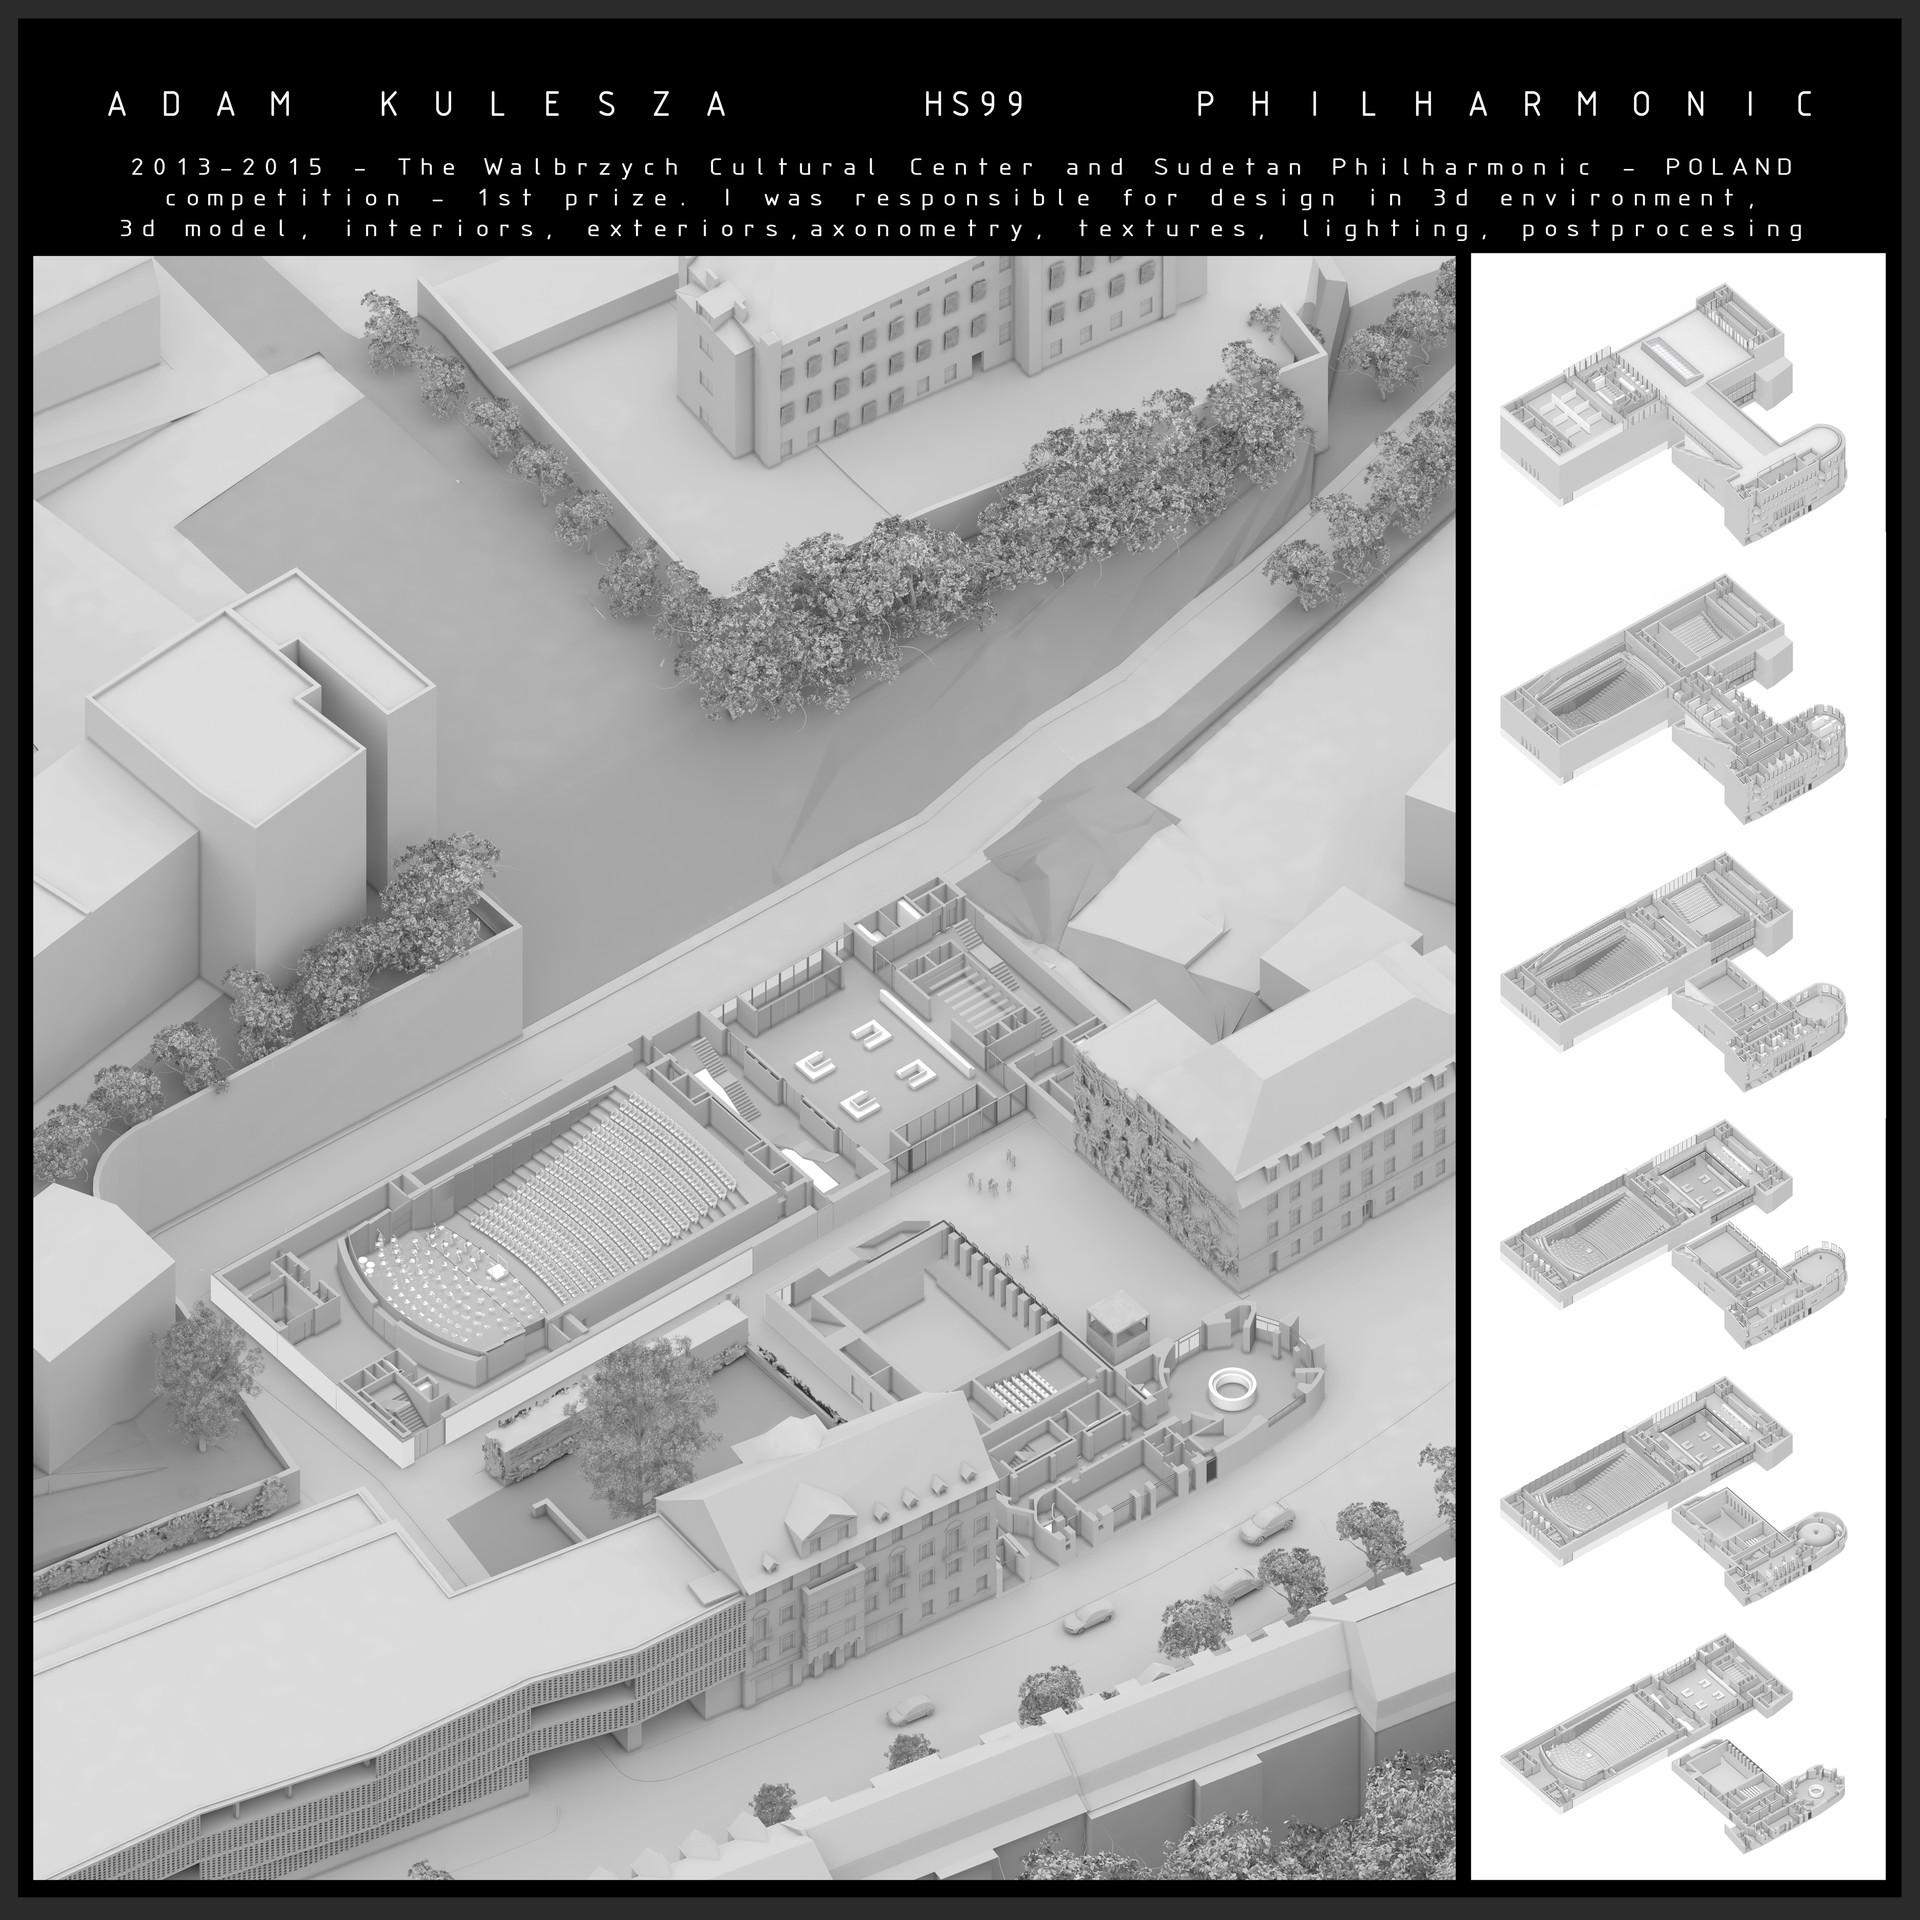 Adam bernard kulesza 2013 portfolio hs99 ckiwg 005 s